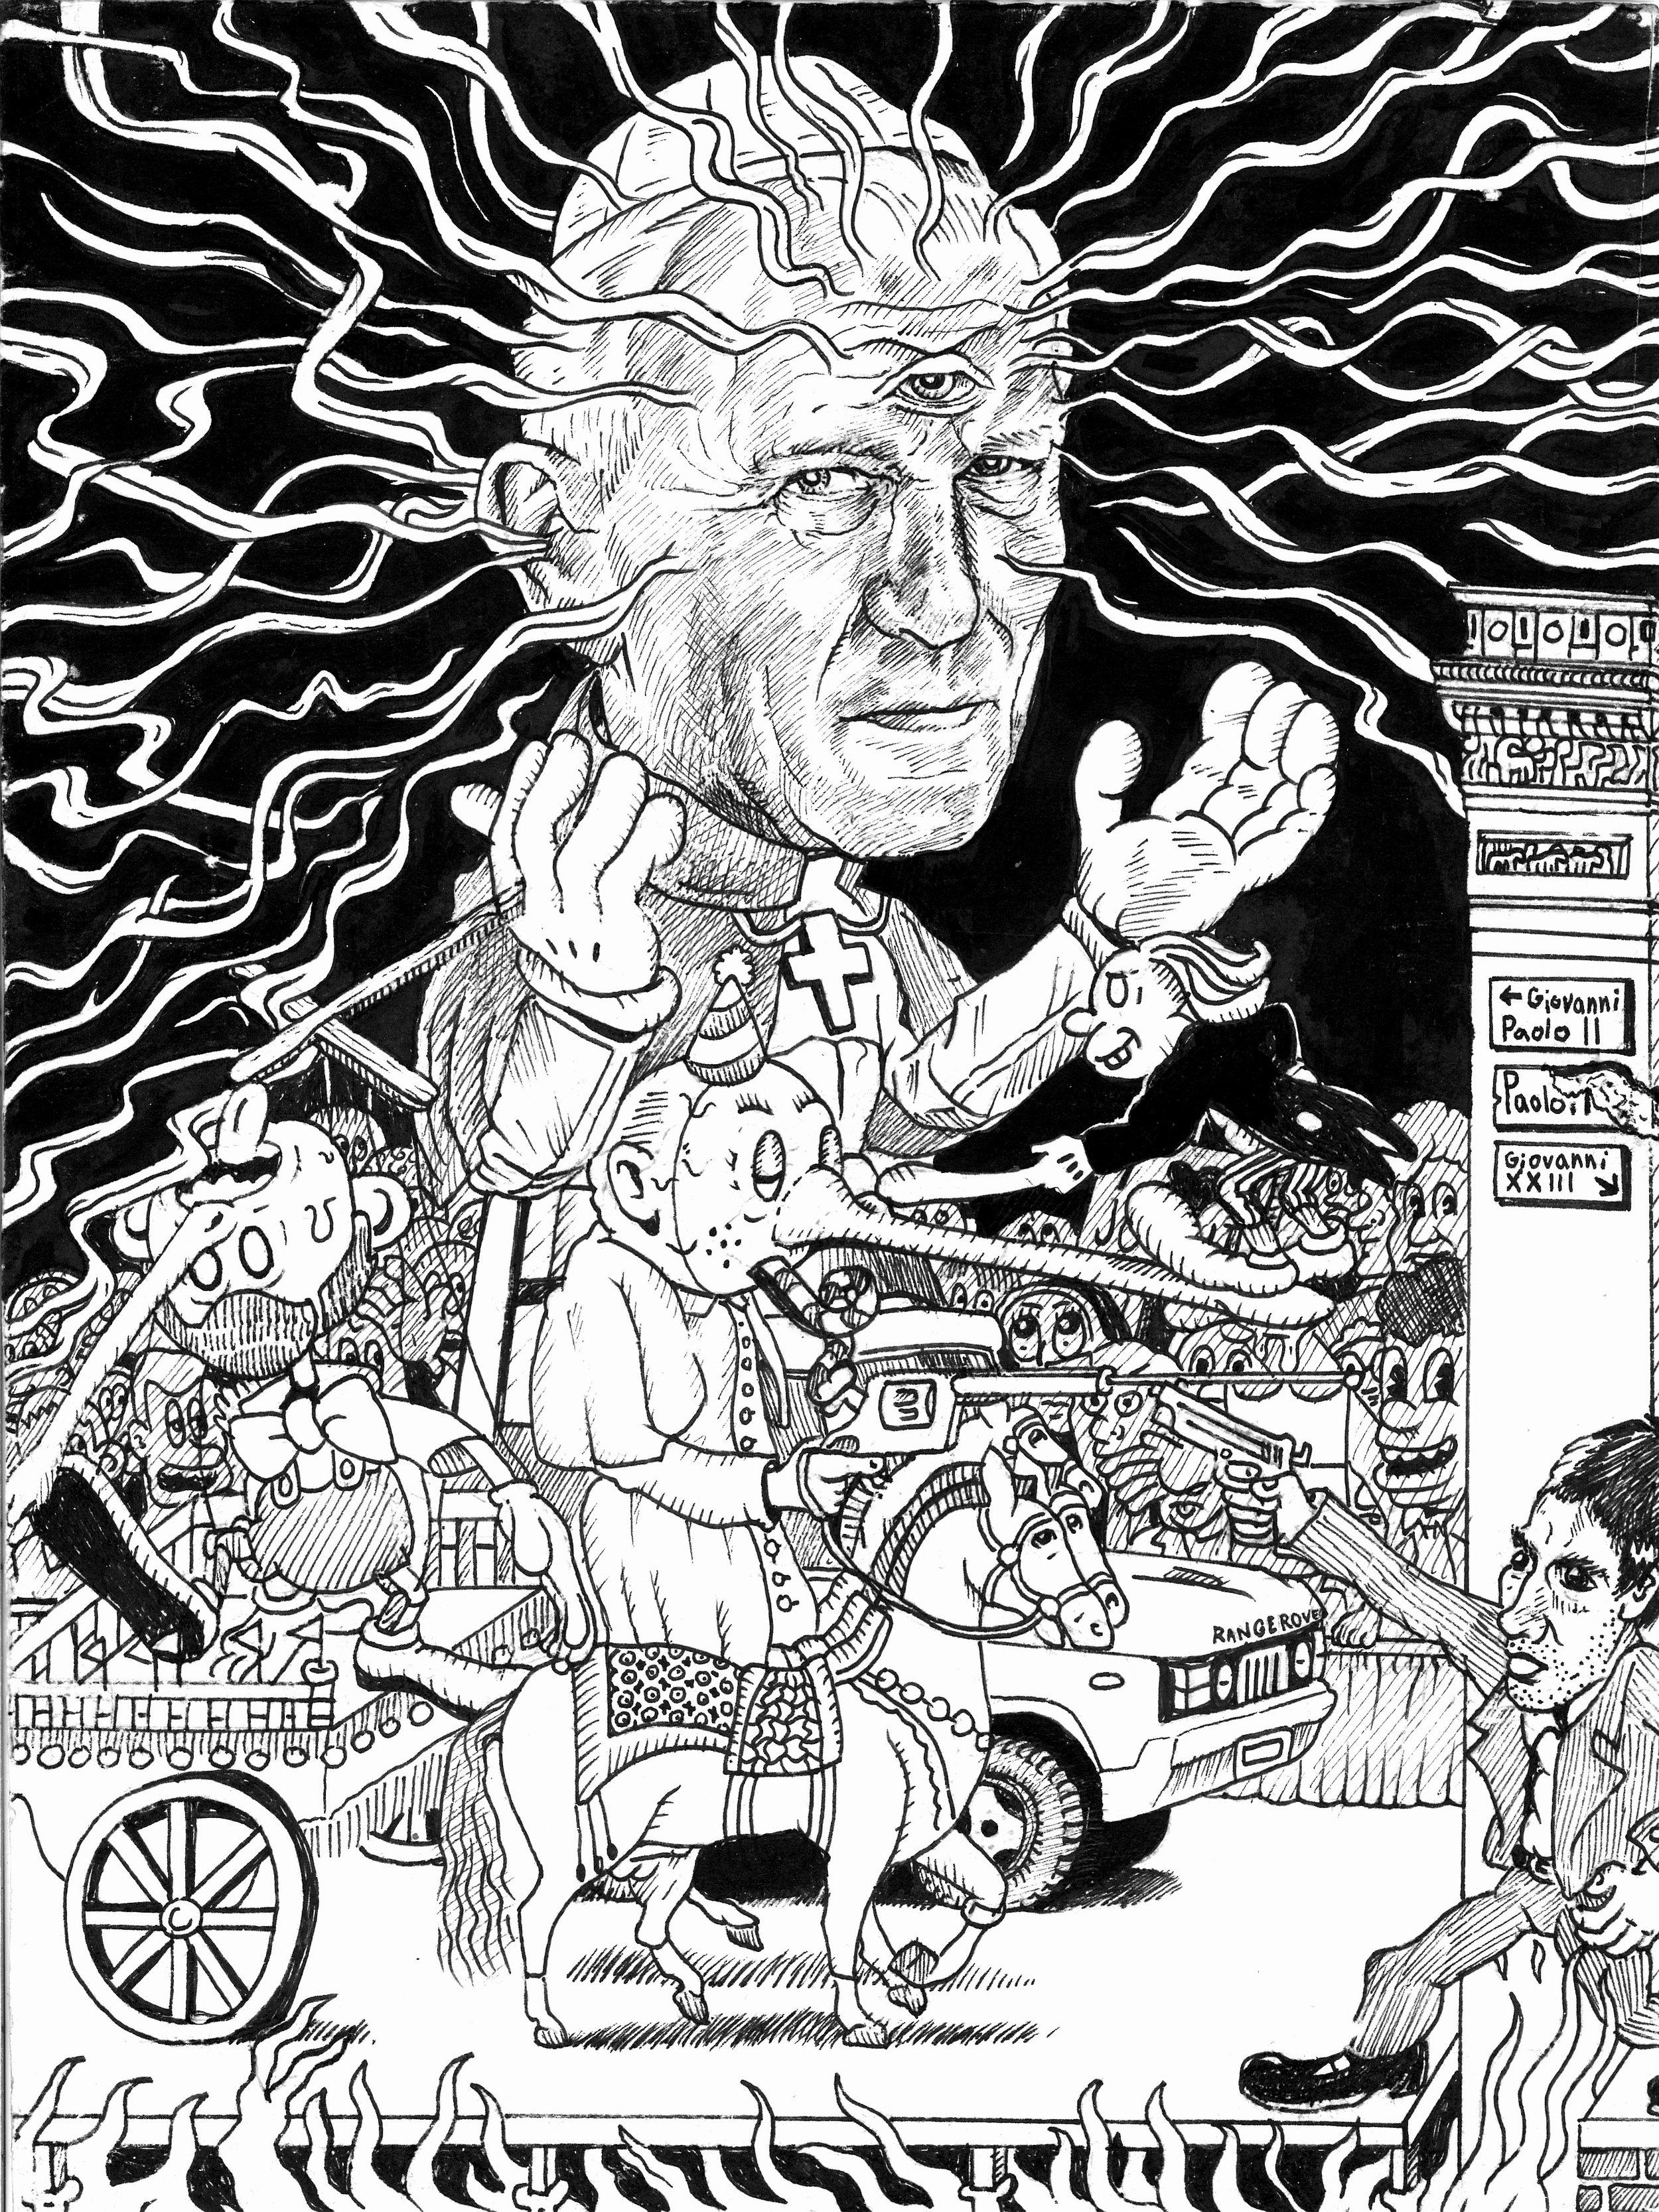 Papas Being Papas (Detail of Pope John Paul II)